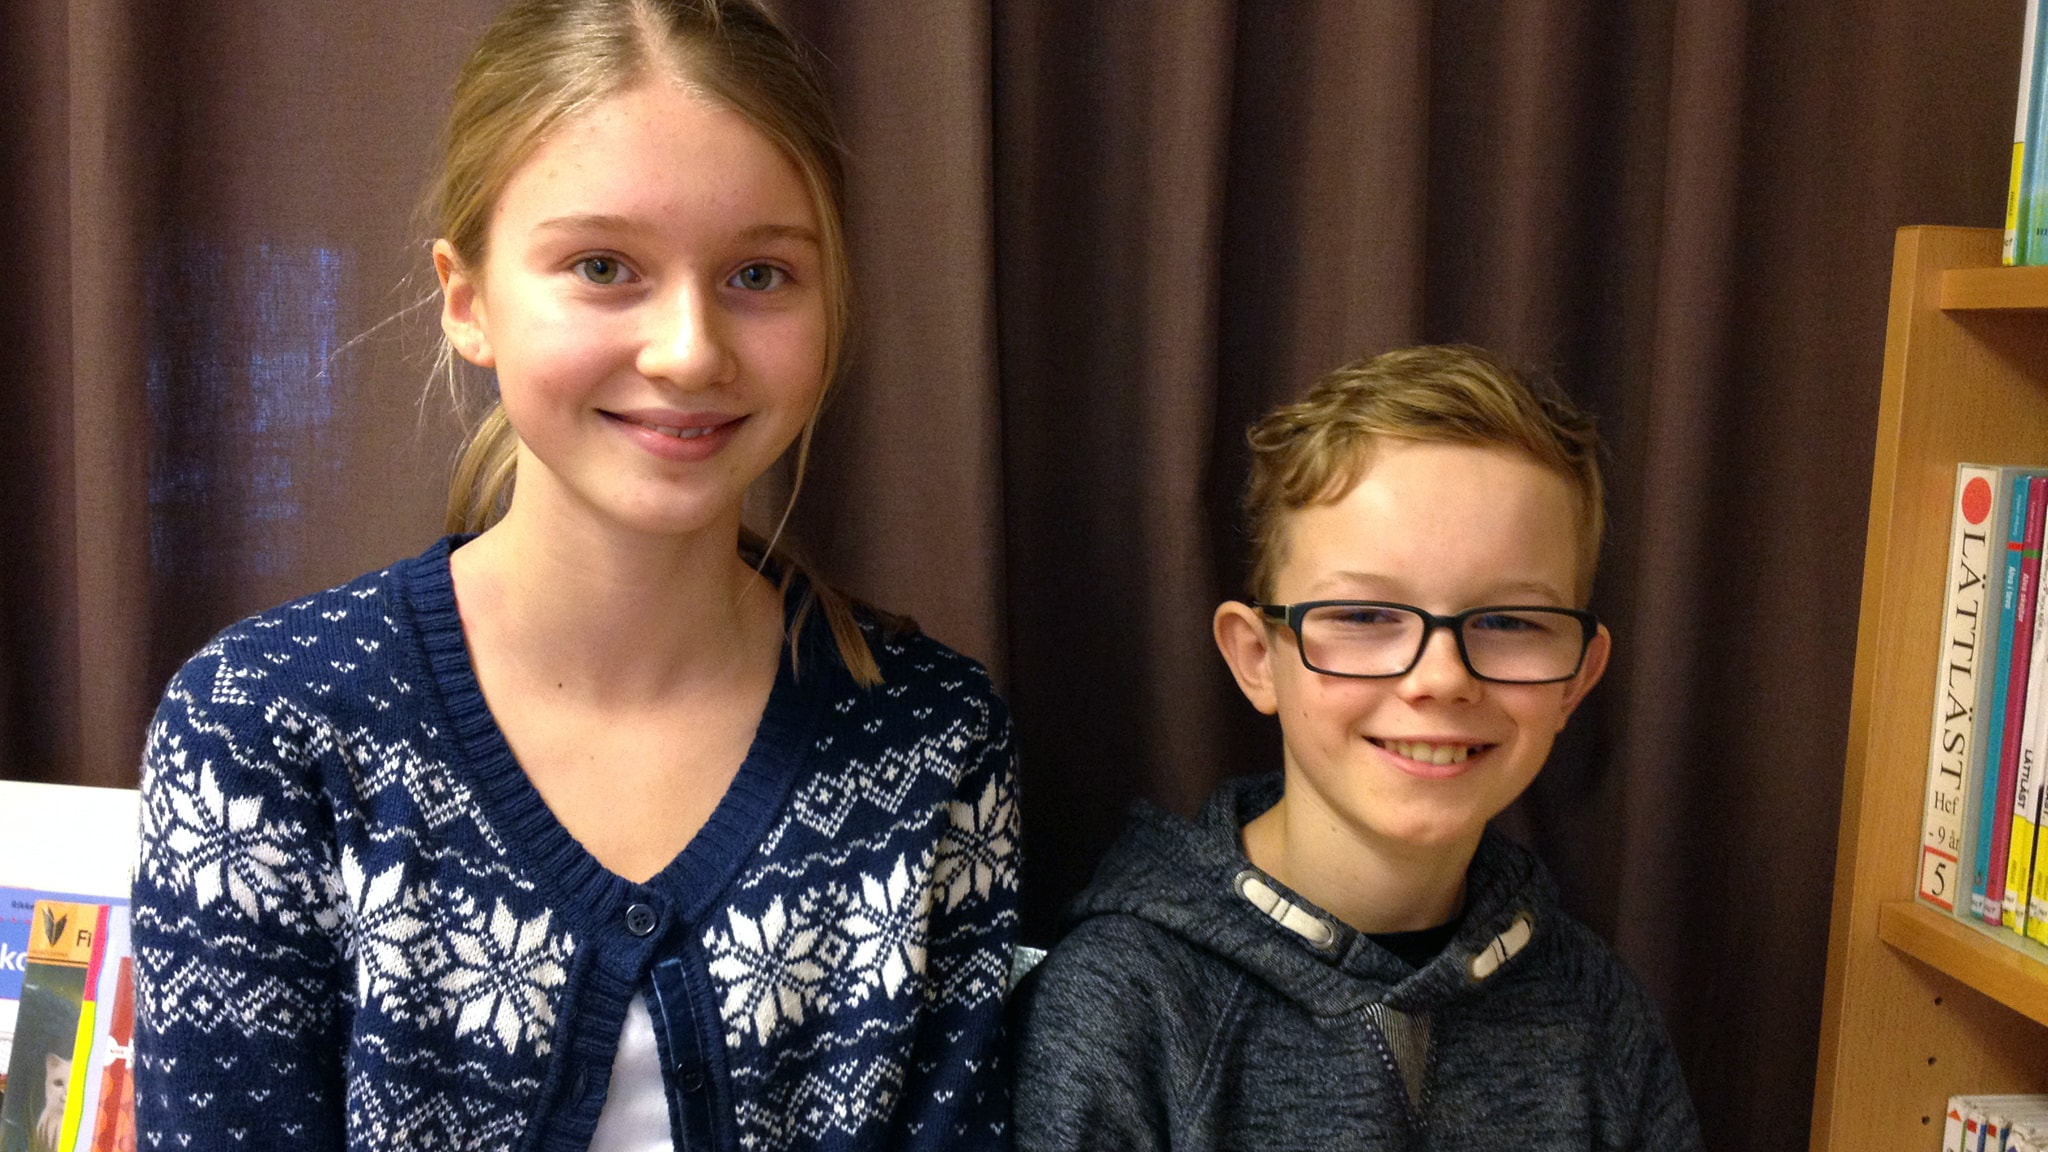 Hilda Rönn och Edwin Mattson från Ulrikaskolan i Ulricehamn.